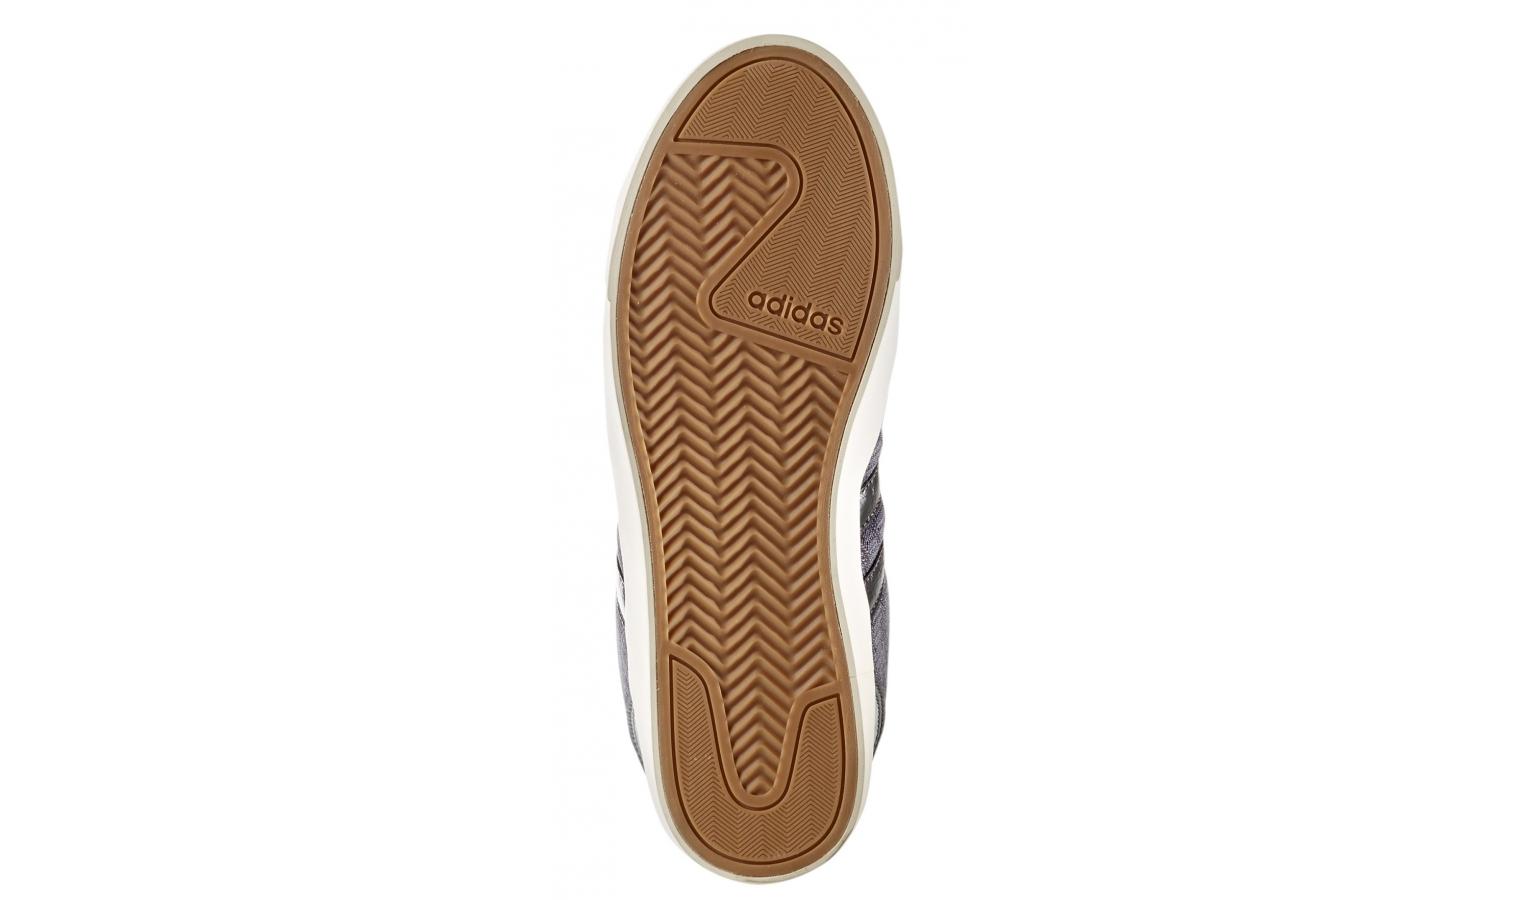 22b63b8c026 ... Dámské kotníkové boty adidas CF DAILY QT MID W šedé. Sleva